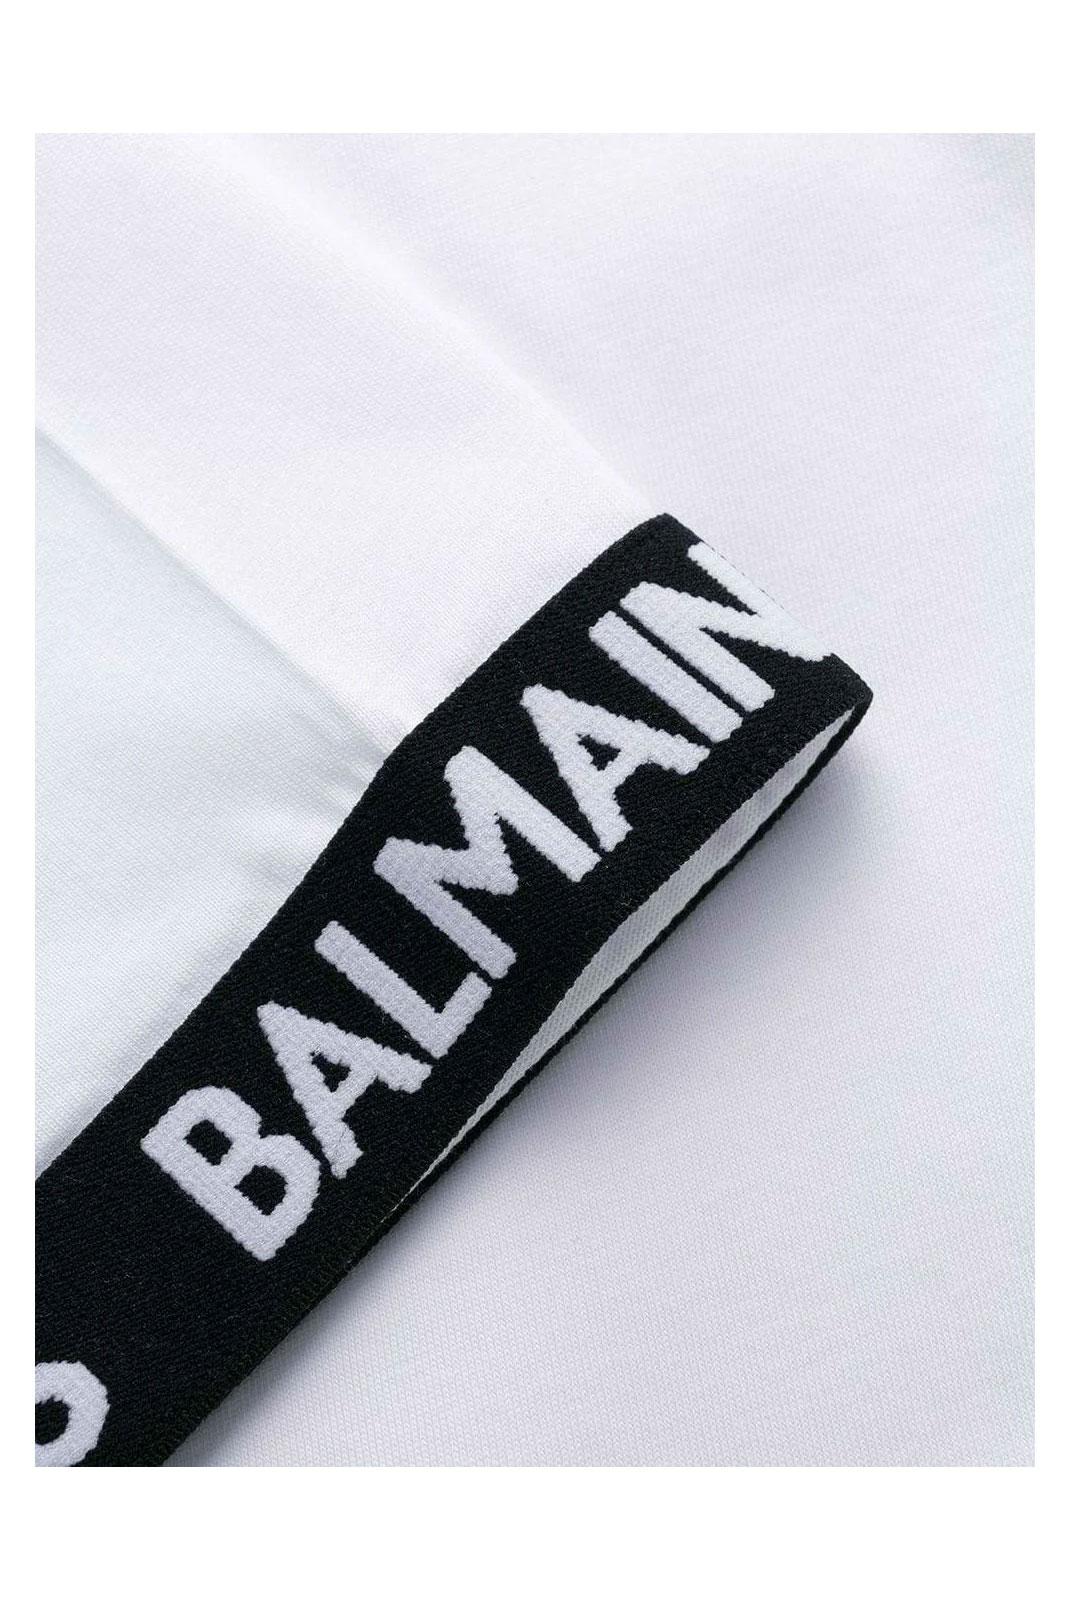 T-S manches courtes  Balmain SH11182 100 WHITE